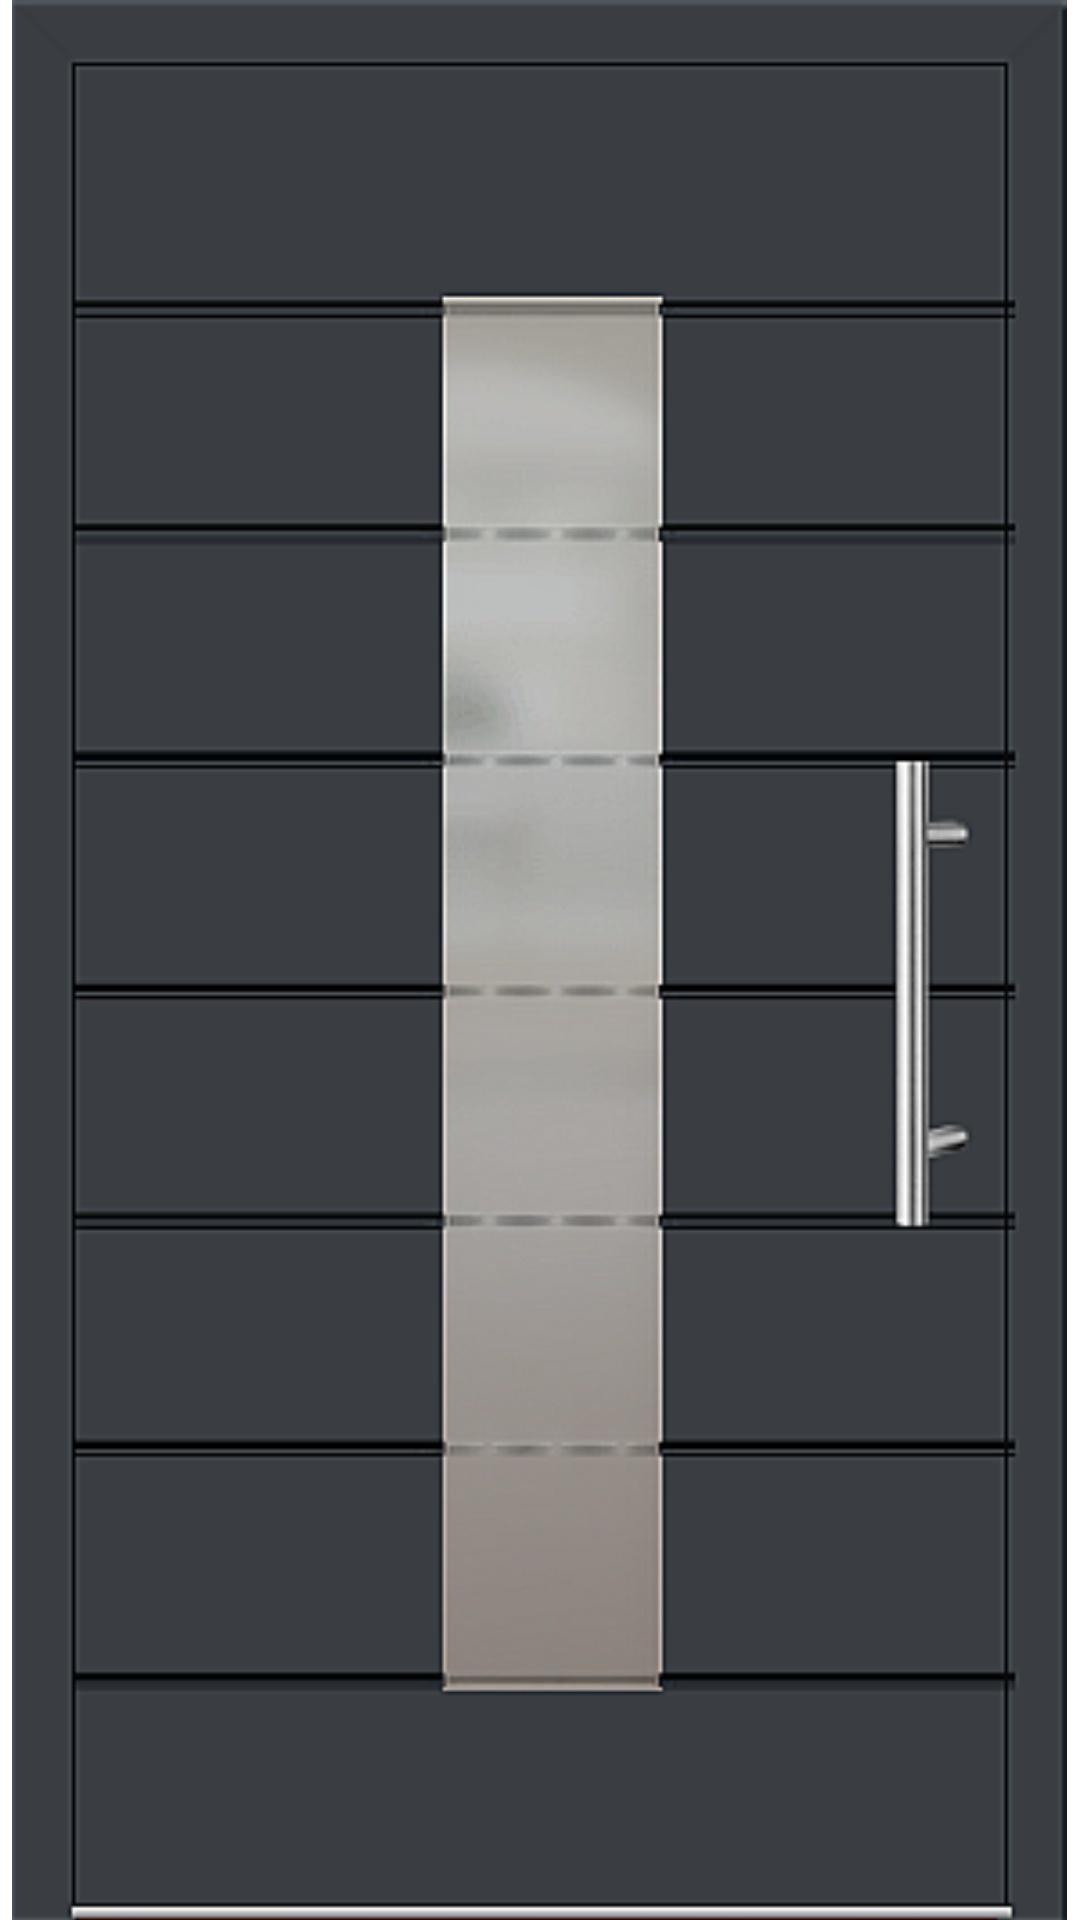 Aluminium Haustür Modell 6559-52 anthrazitgrau